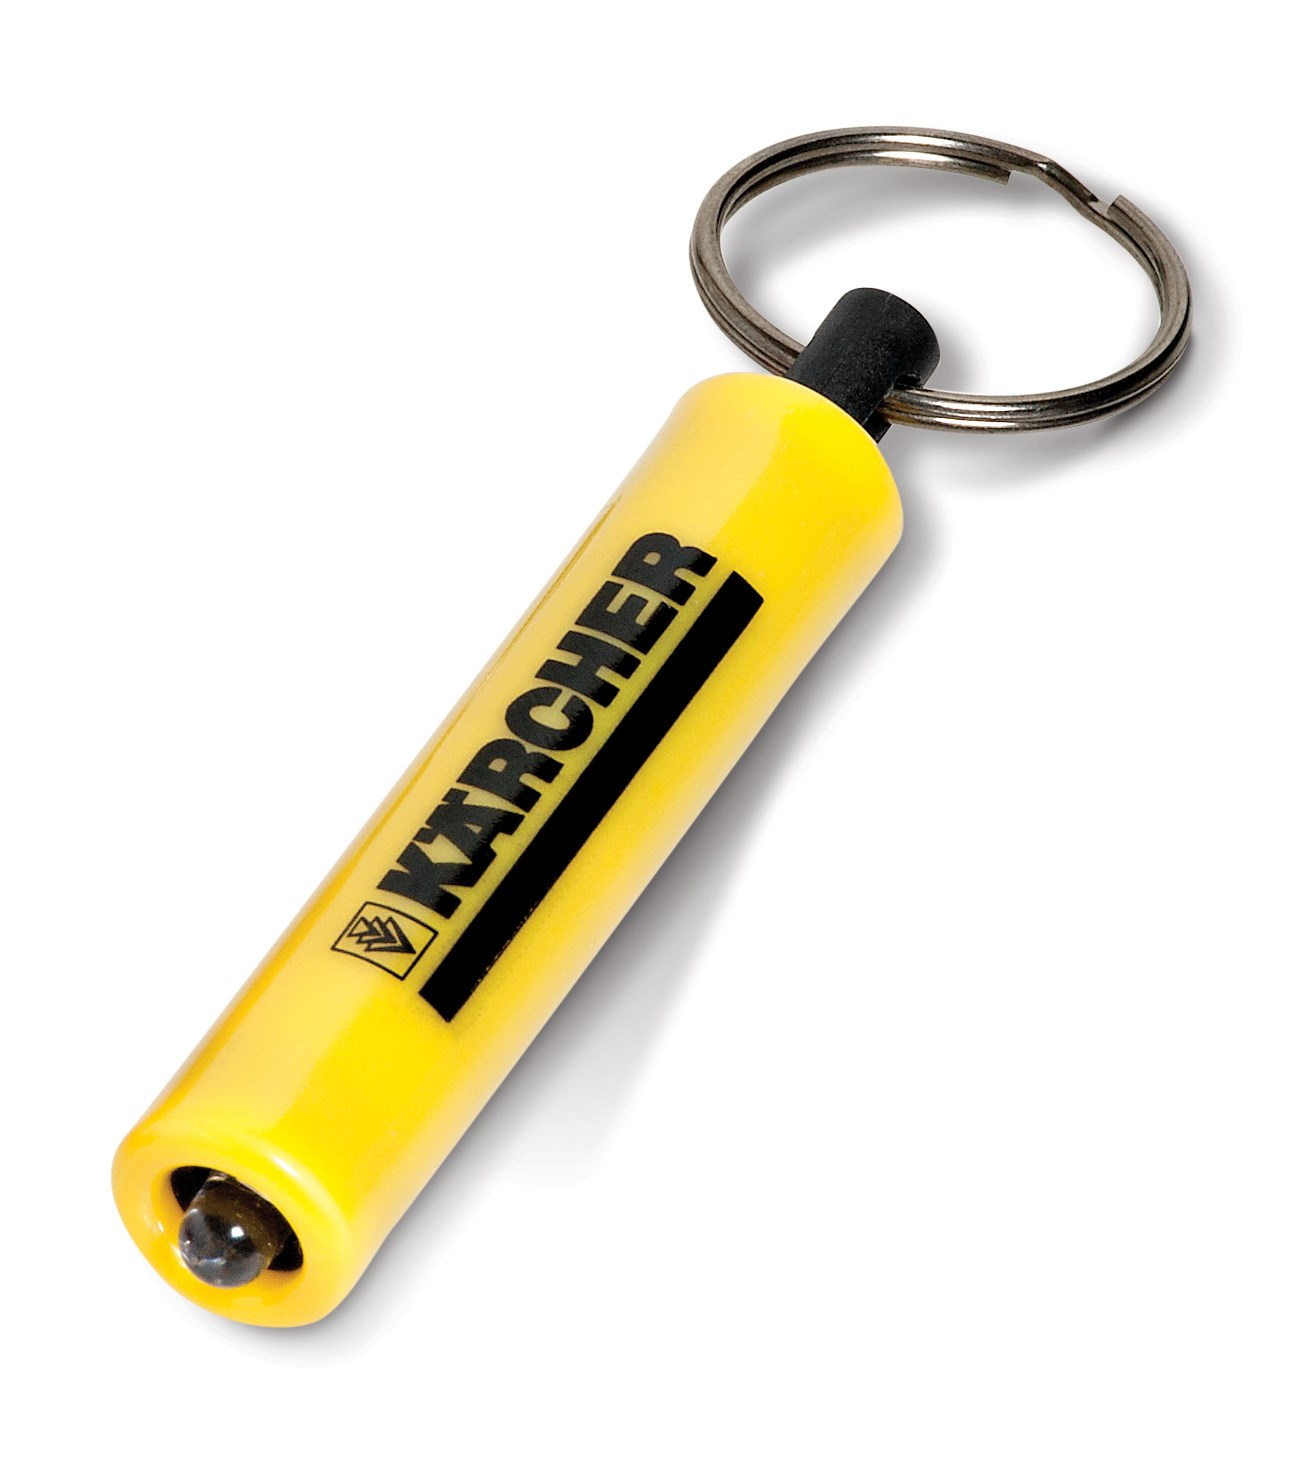 Product: Tubular Torch Keyholder